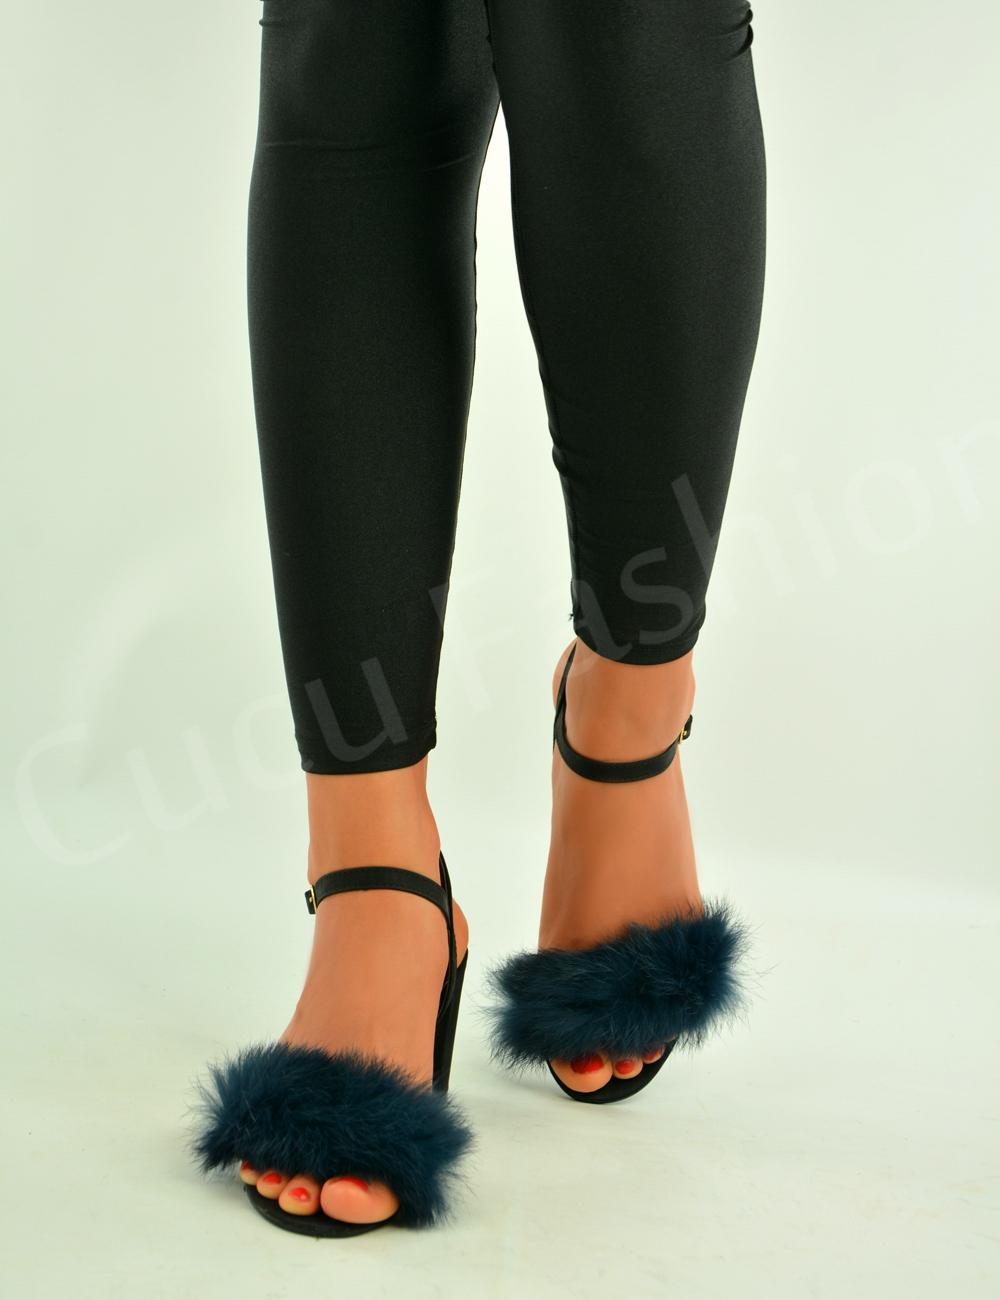 Womens sandals mid heel - New Womens Ladies Block Mid Heel Sandals Ankle